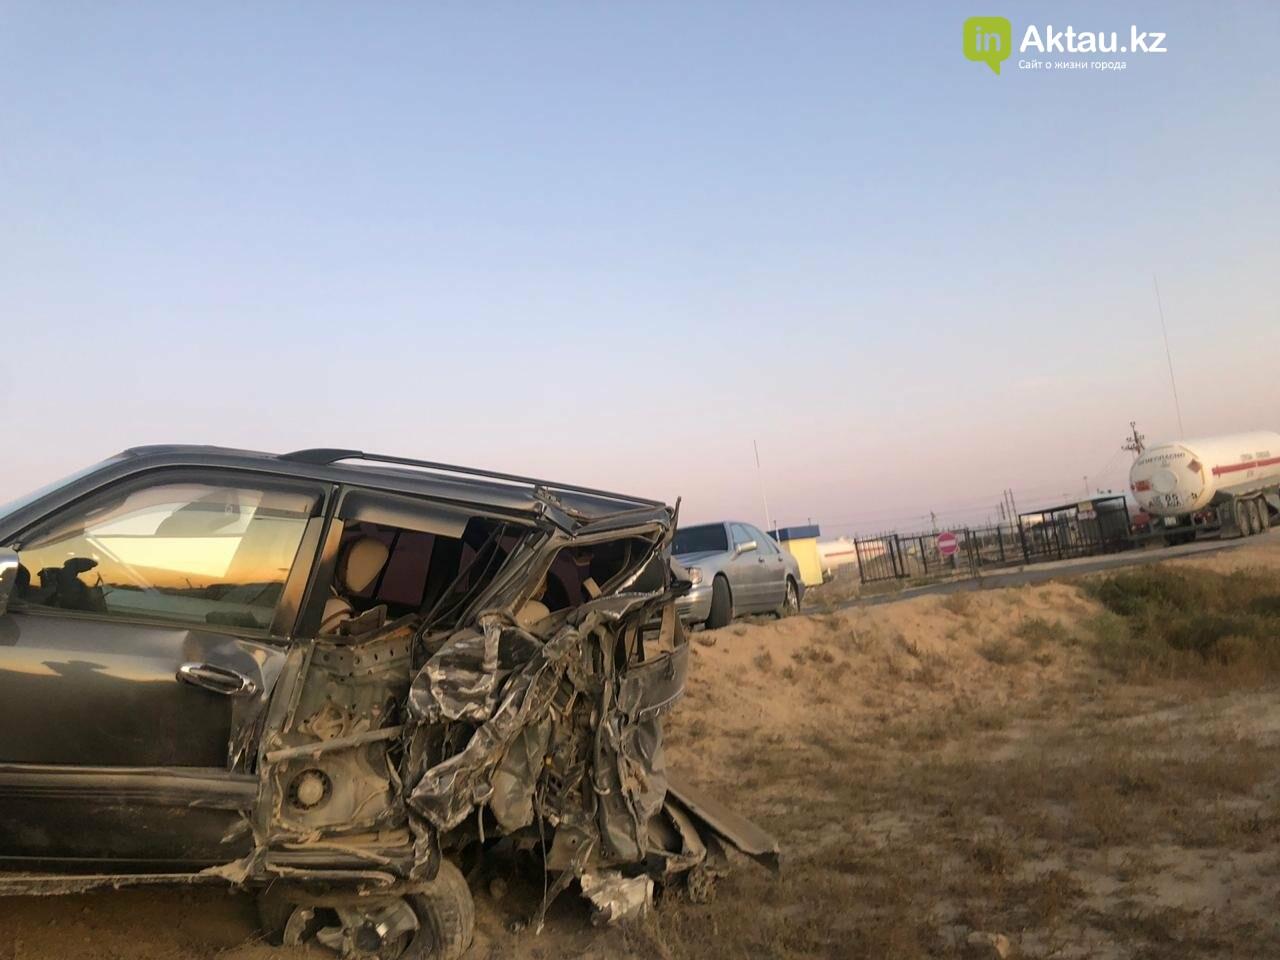 Три автомобиля столкнулись в Жанаозене, фото-1